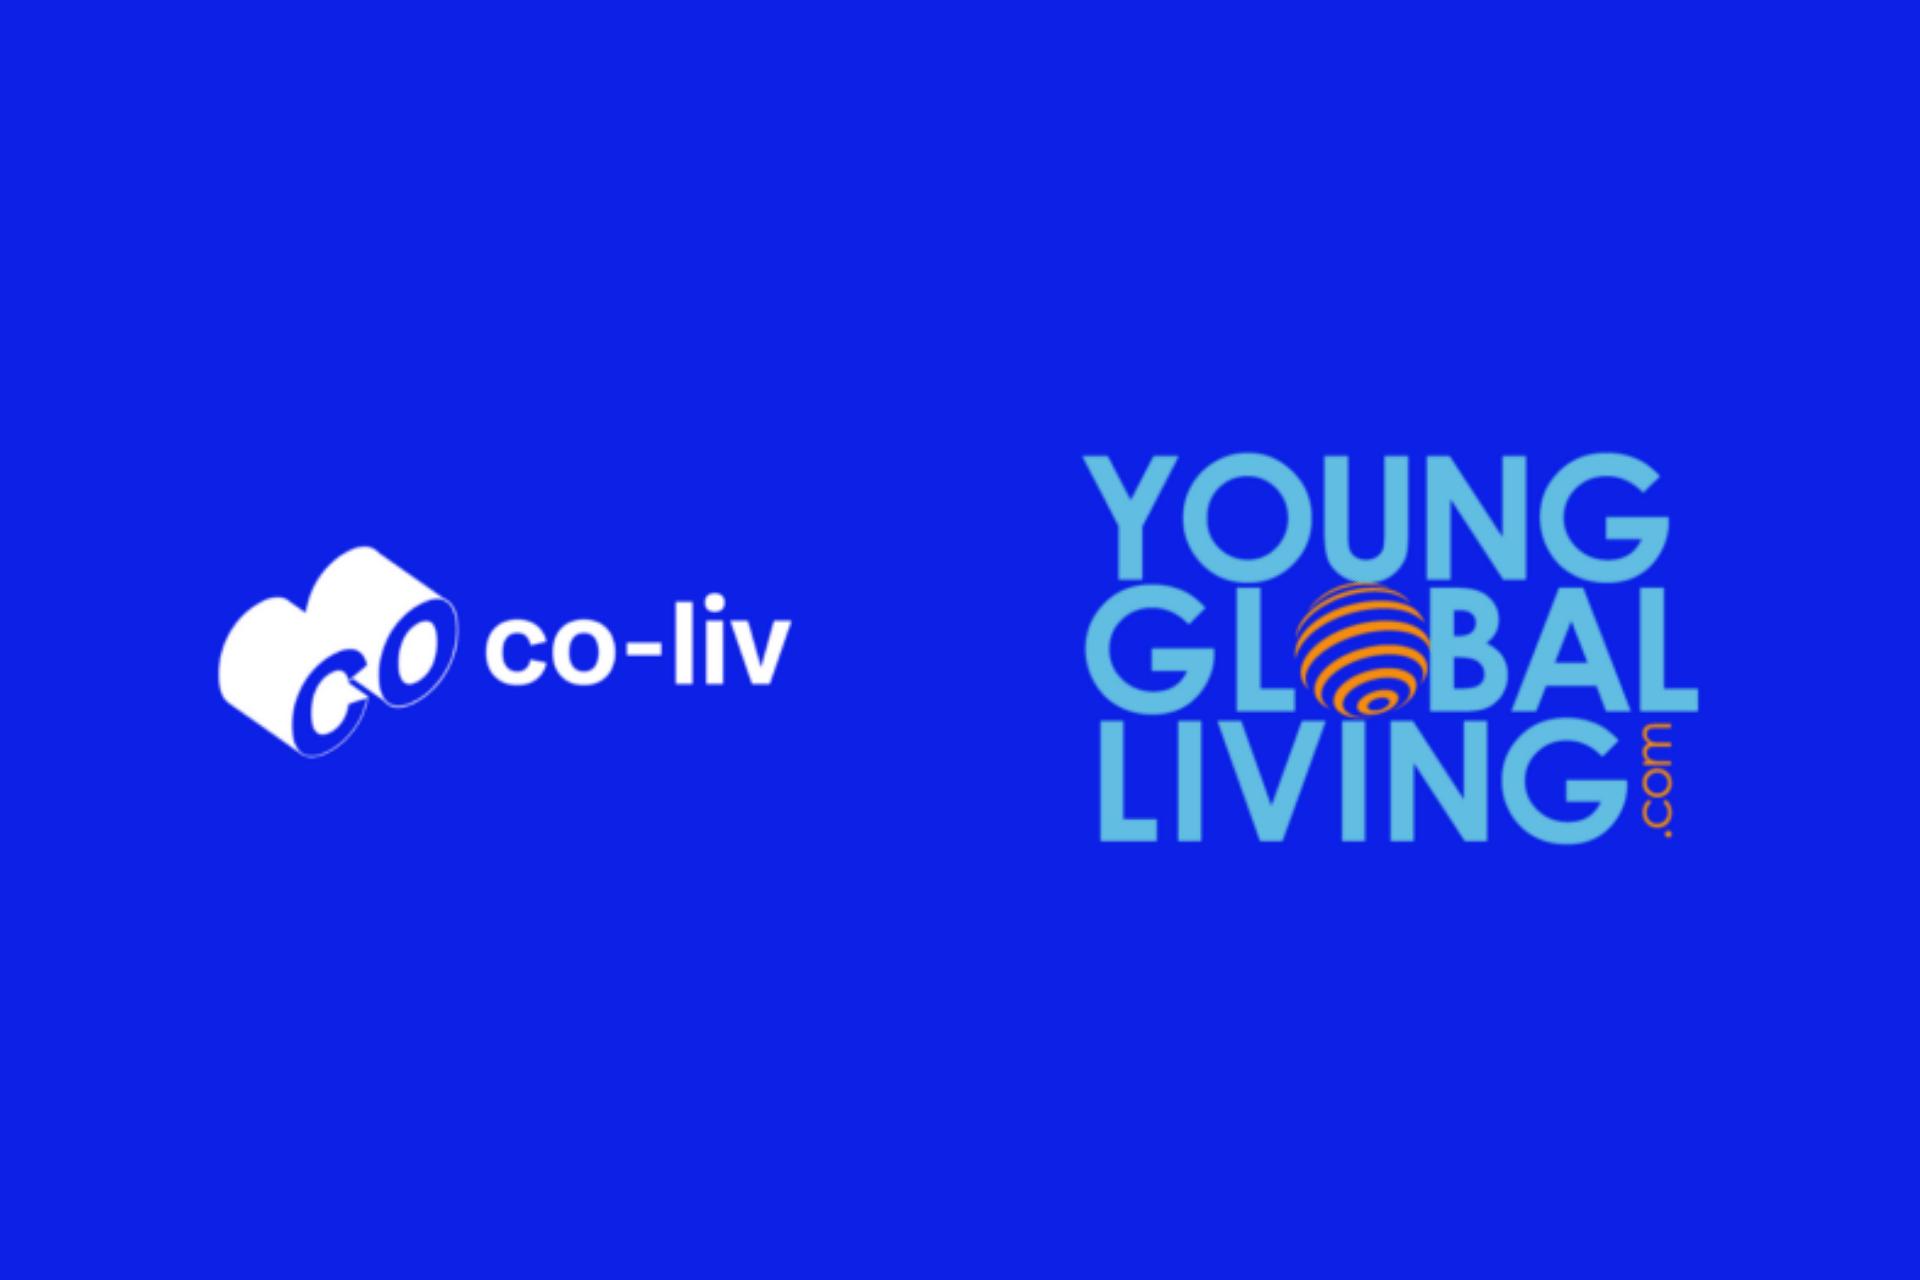 Co-liv and Young Globa Living logos